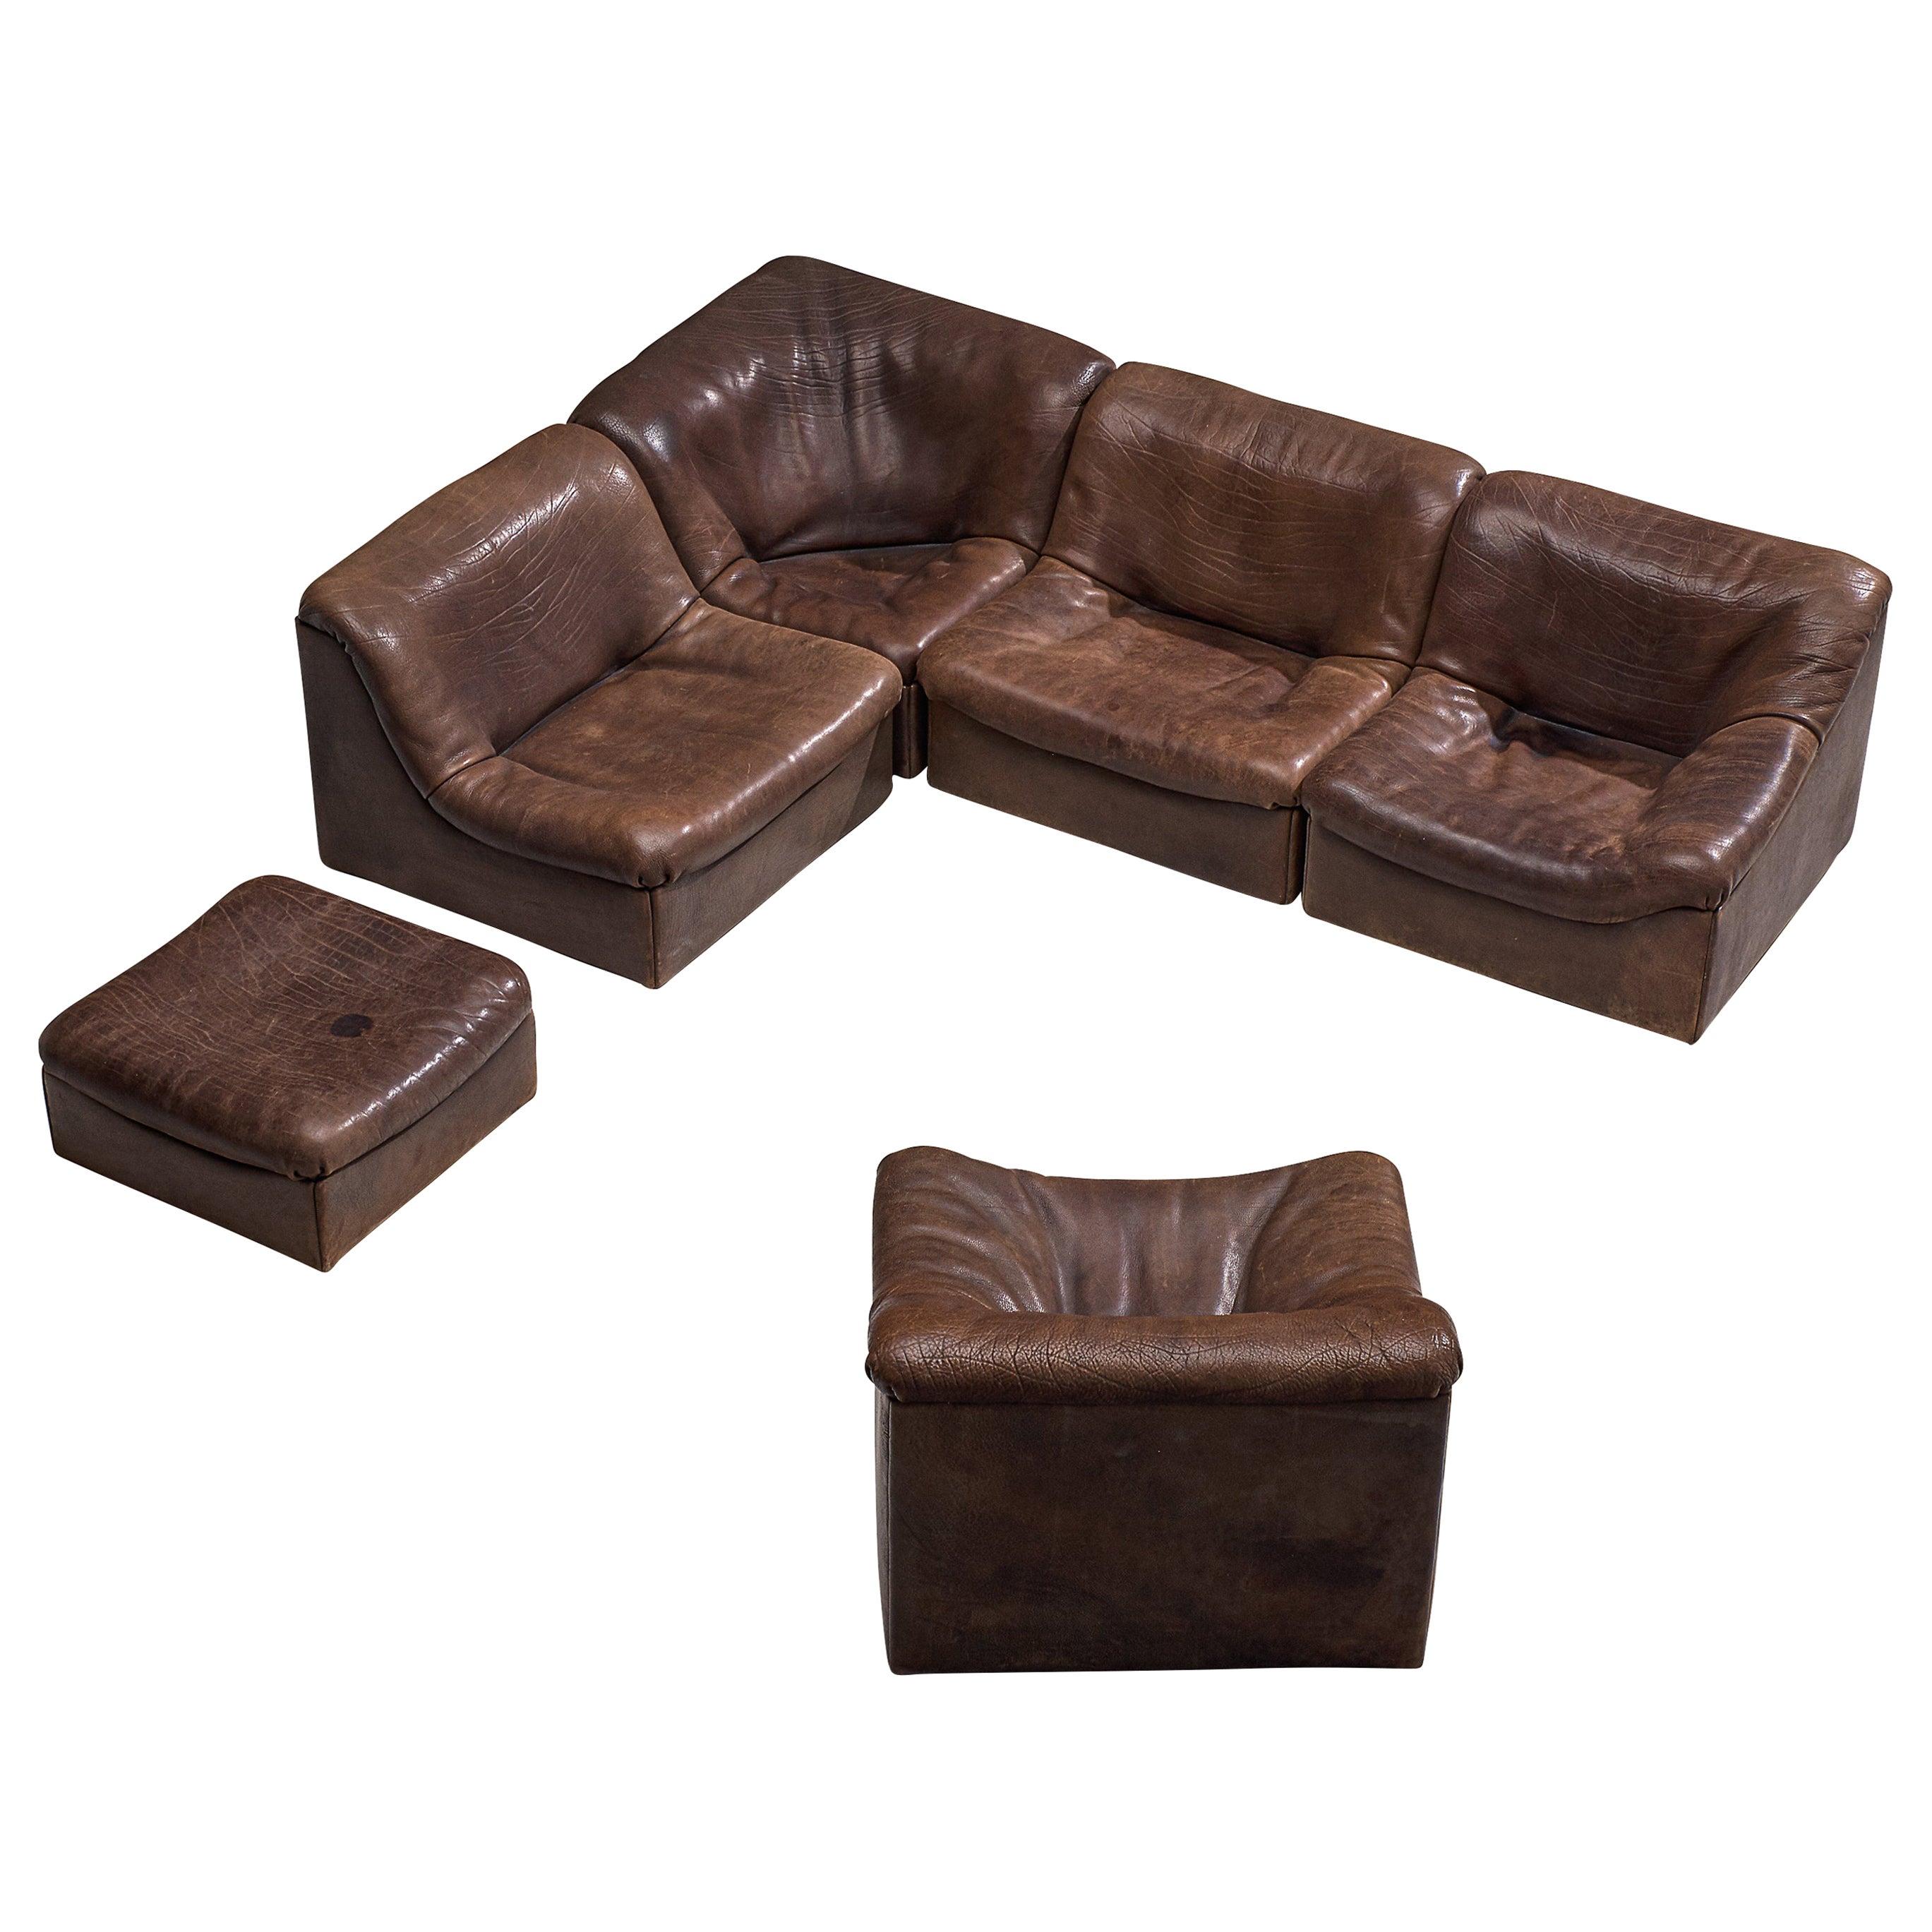 De Sede DS46 Modular Sofa in Brown Leather